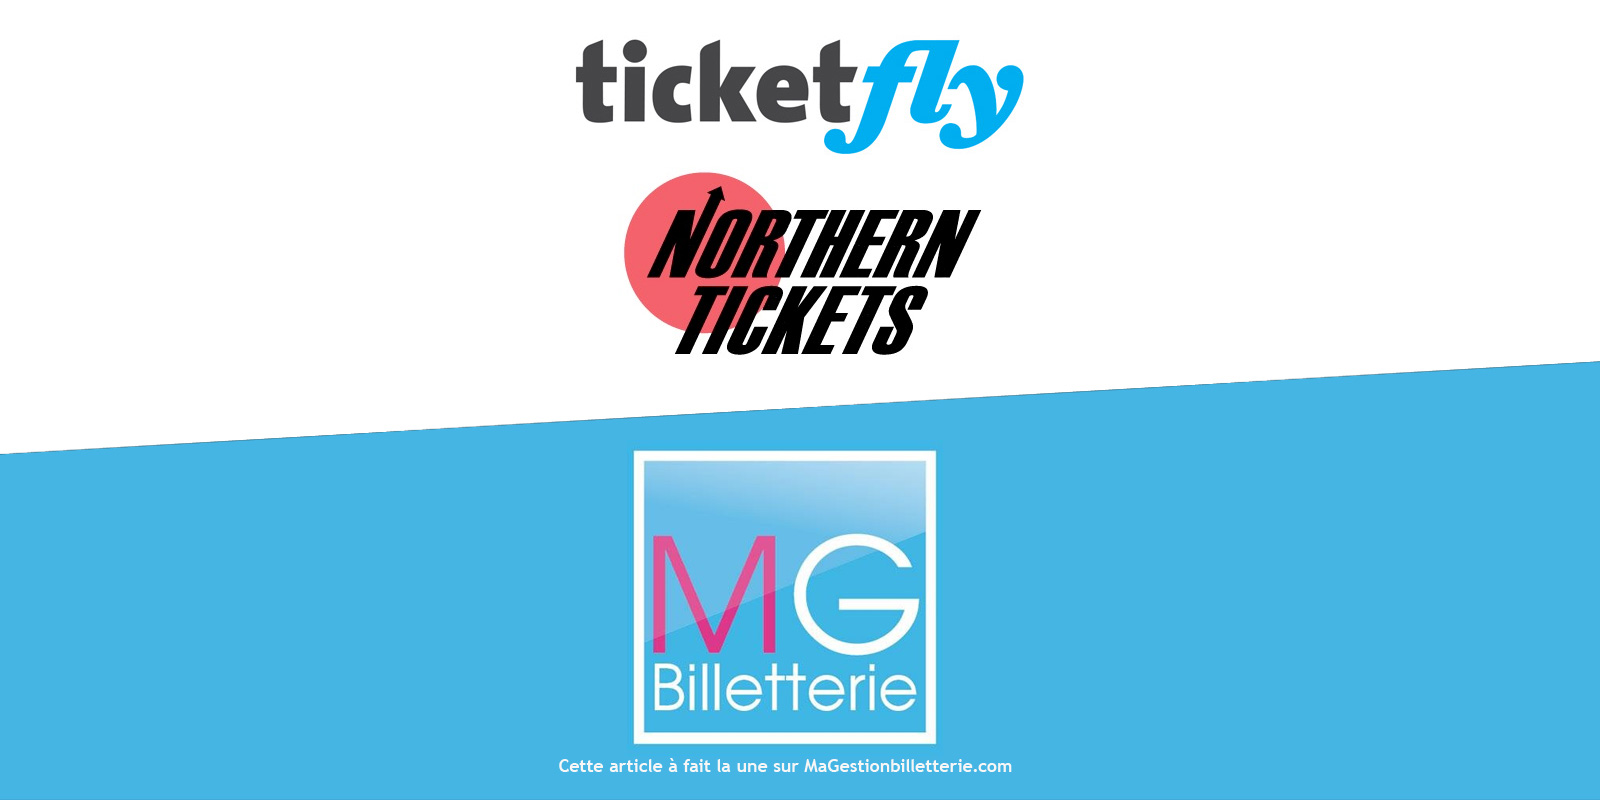 ticketfly-northern-tickets-une3